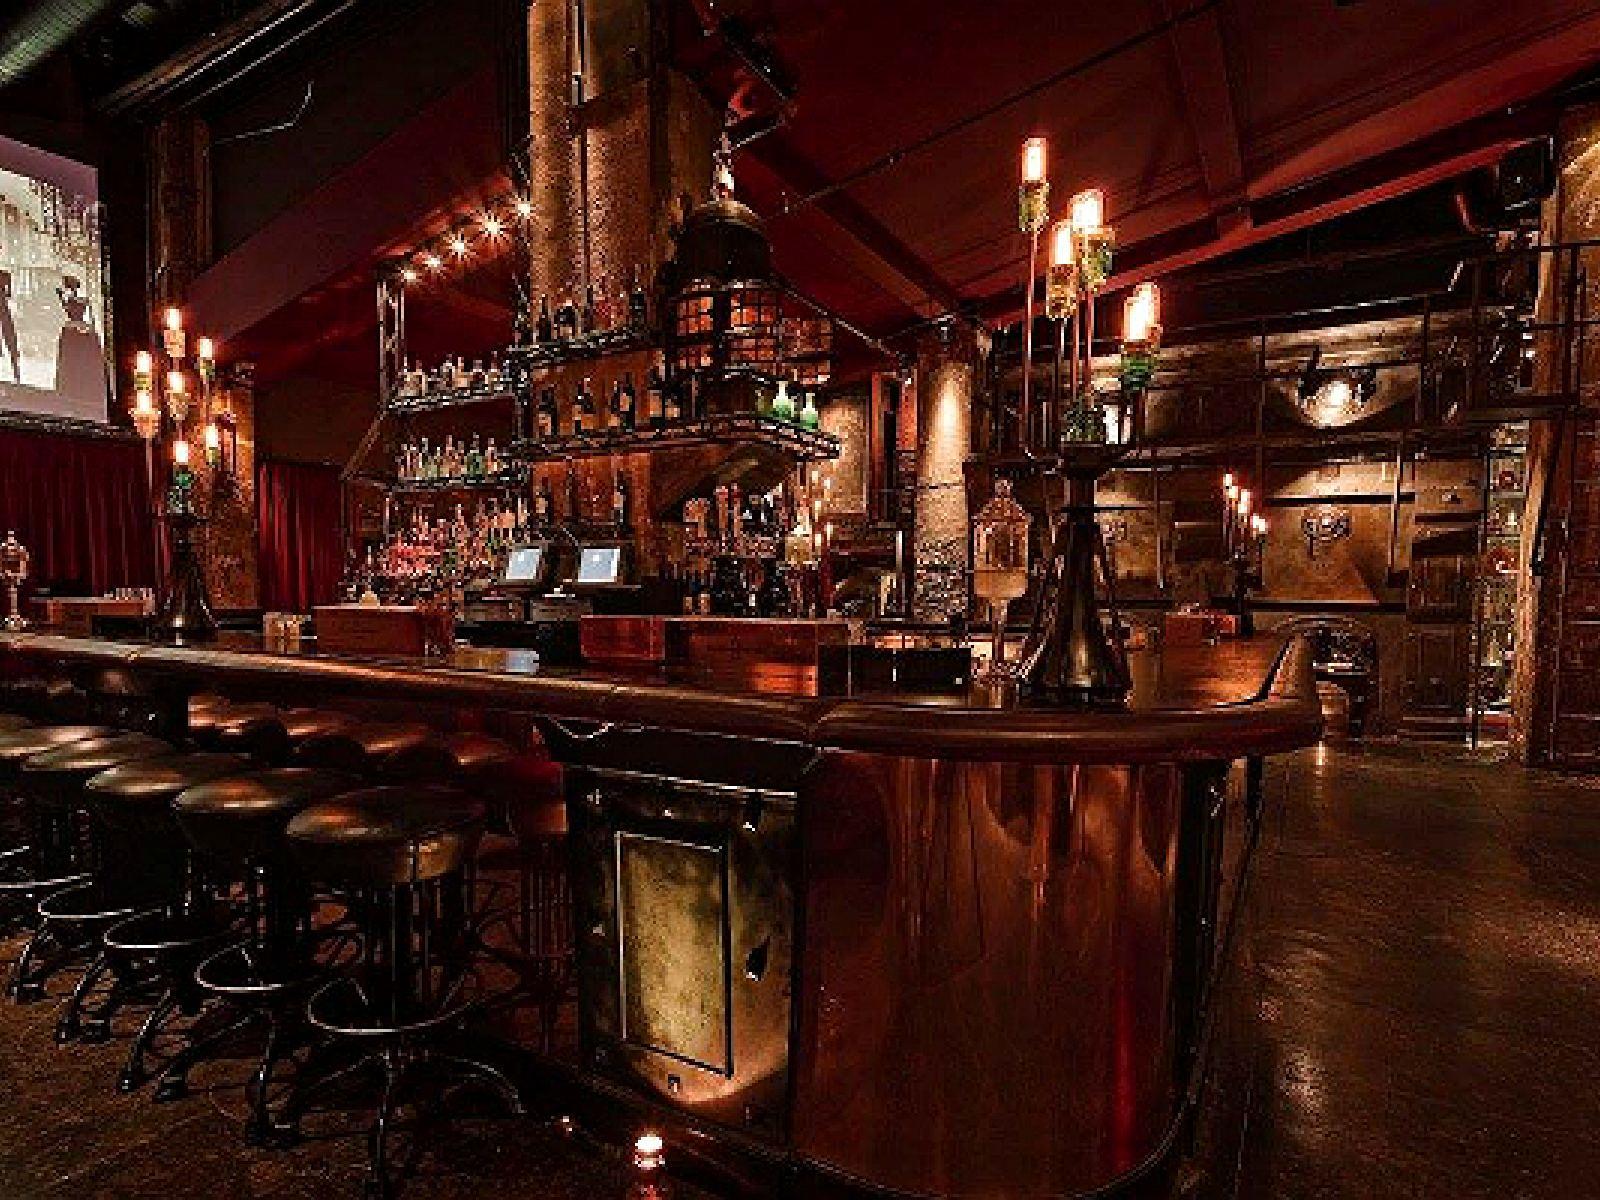 Main image for guide titled Descubre los Bares Escondidos en Los Ángeles